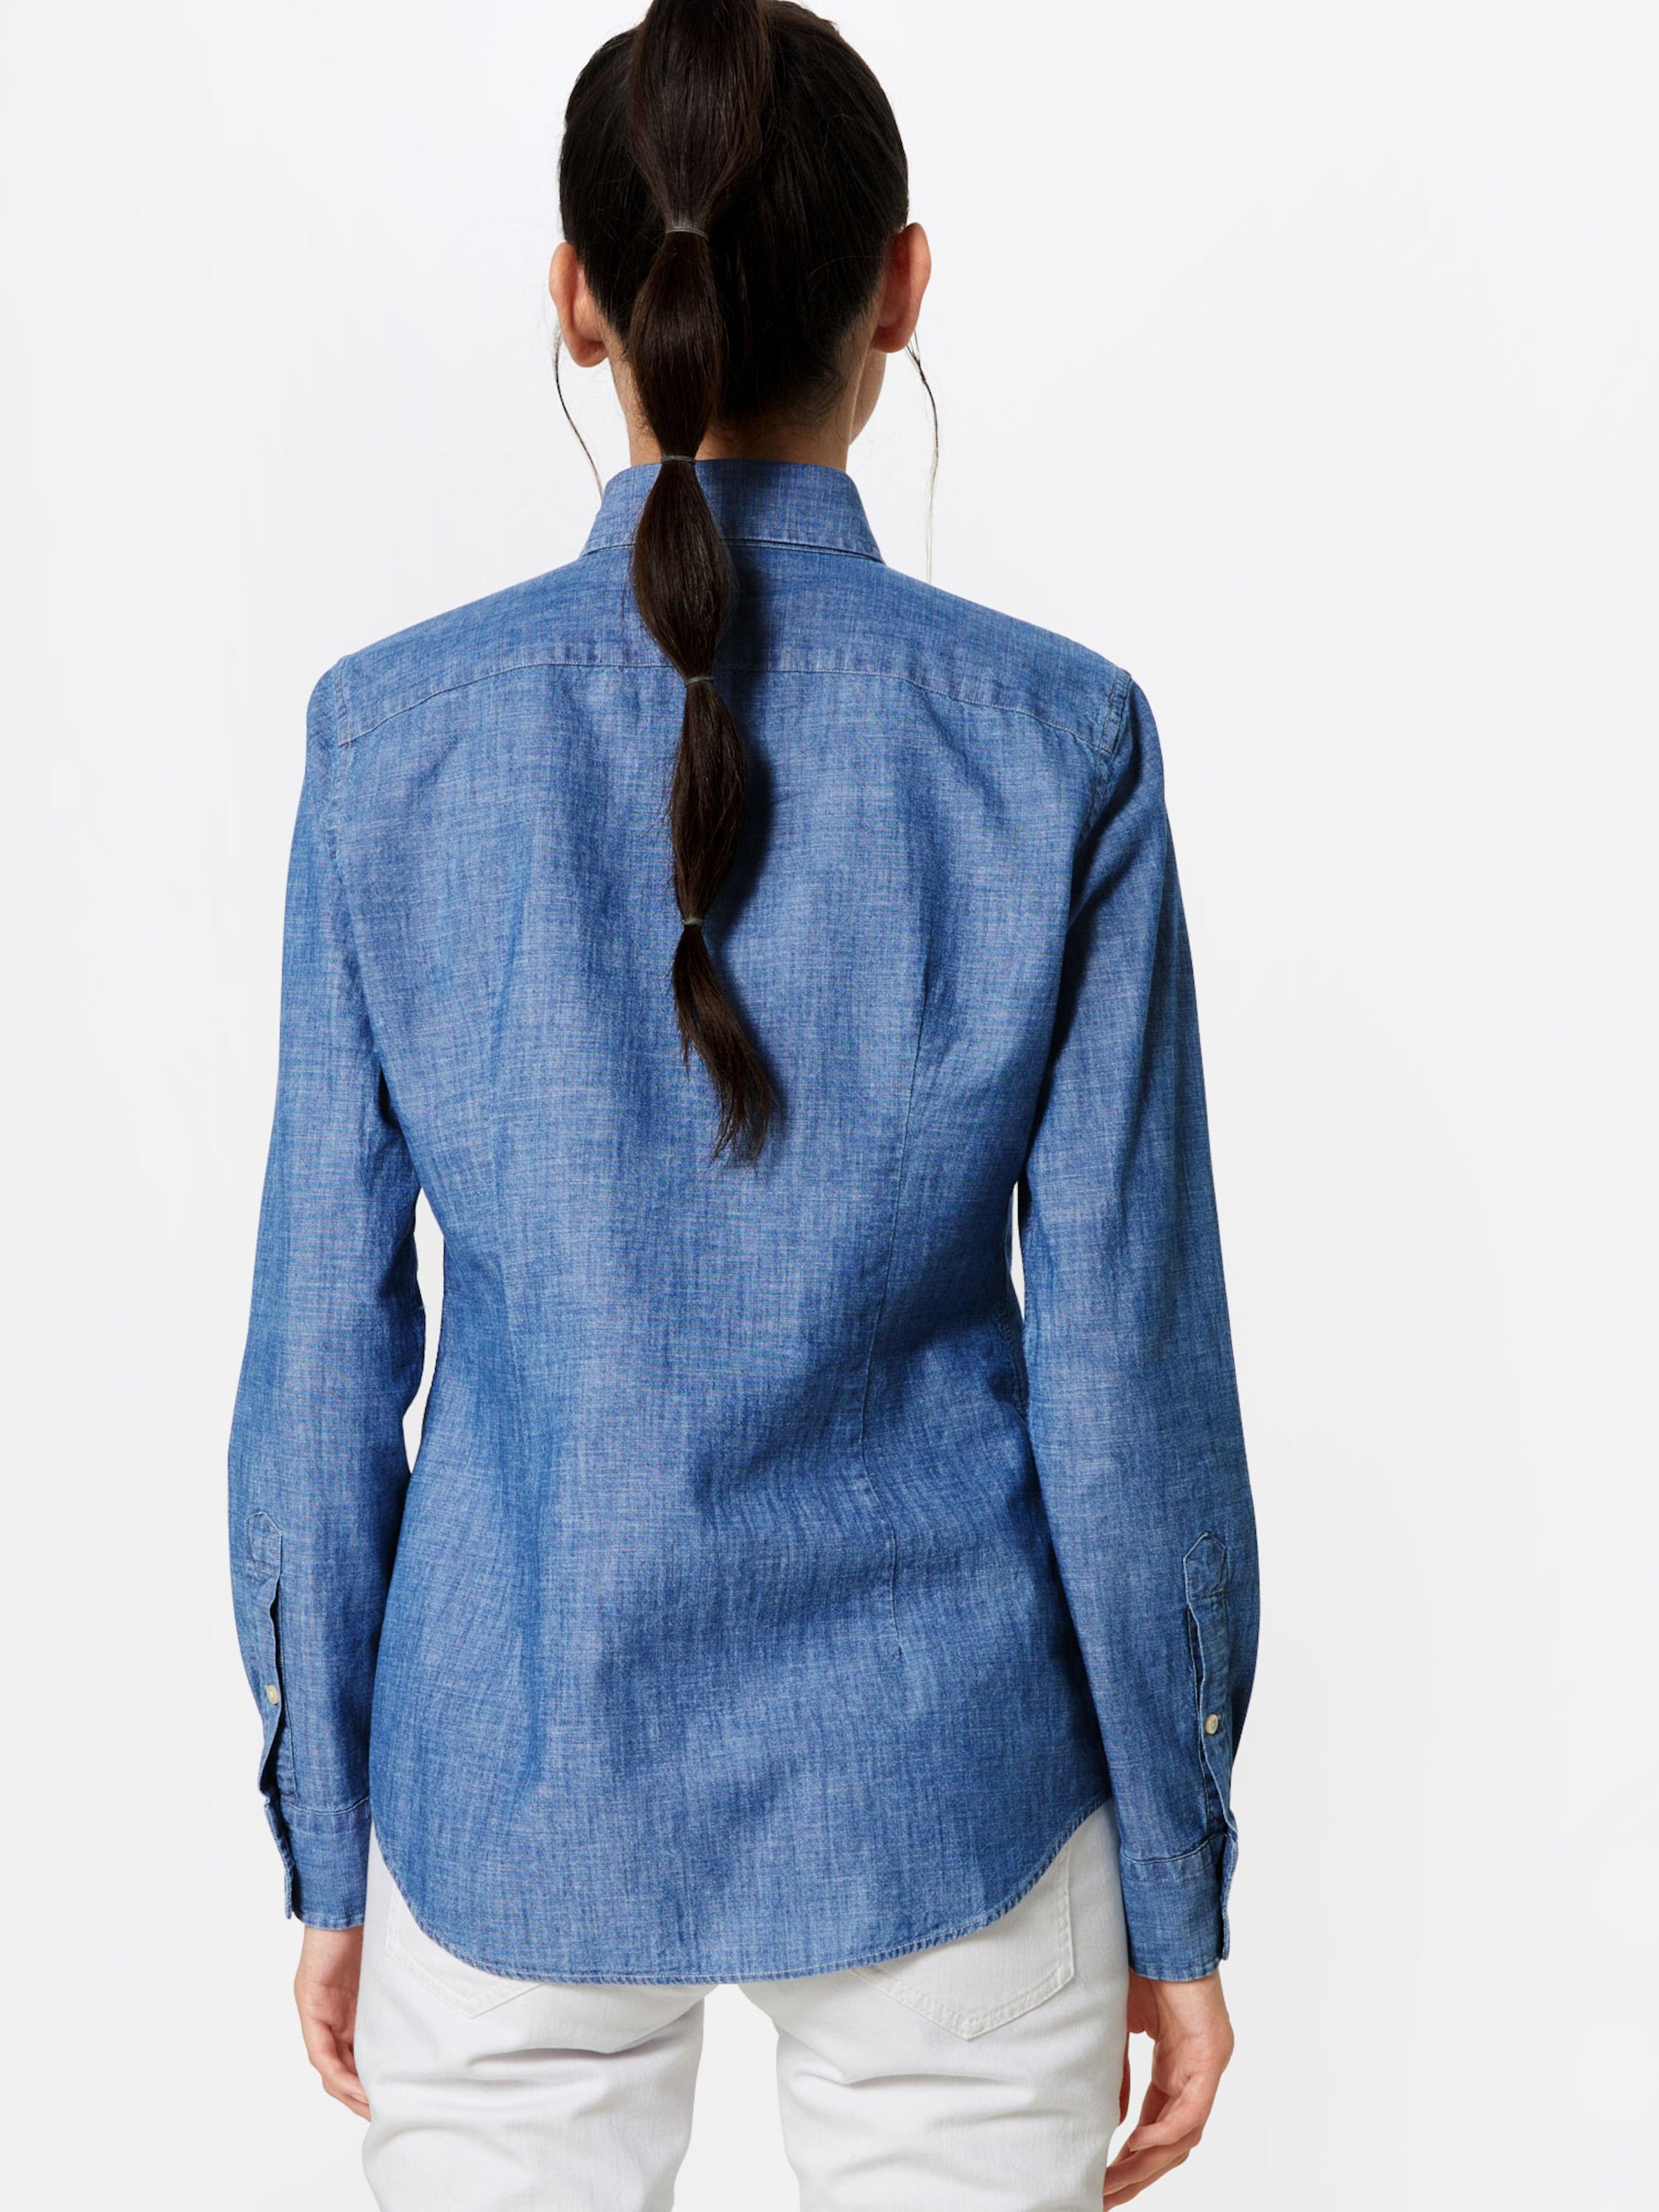 Lauren Ralph En Chemisier 'chambray' Bleu Polo LjUGqSMzVp